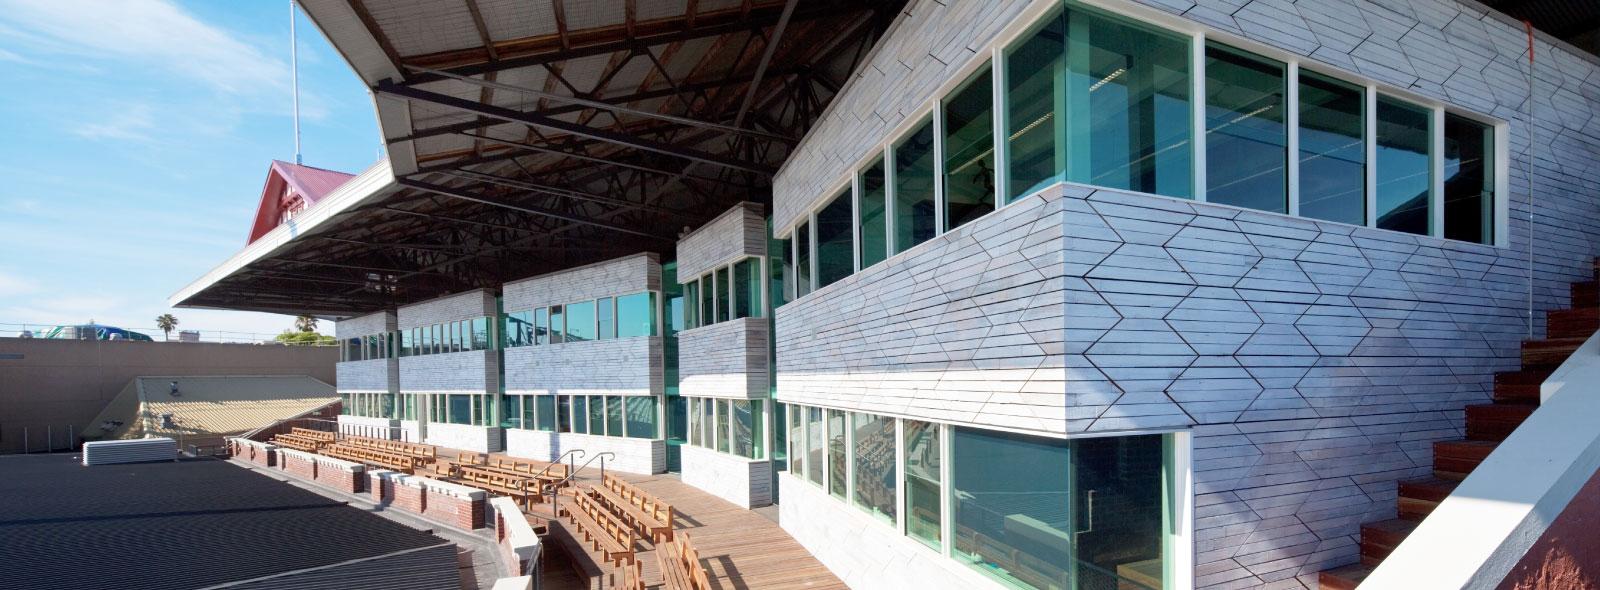 H2o Architects Melbourne-Lakeside Stadium Albert Park-04